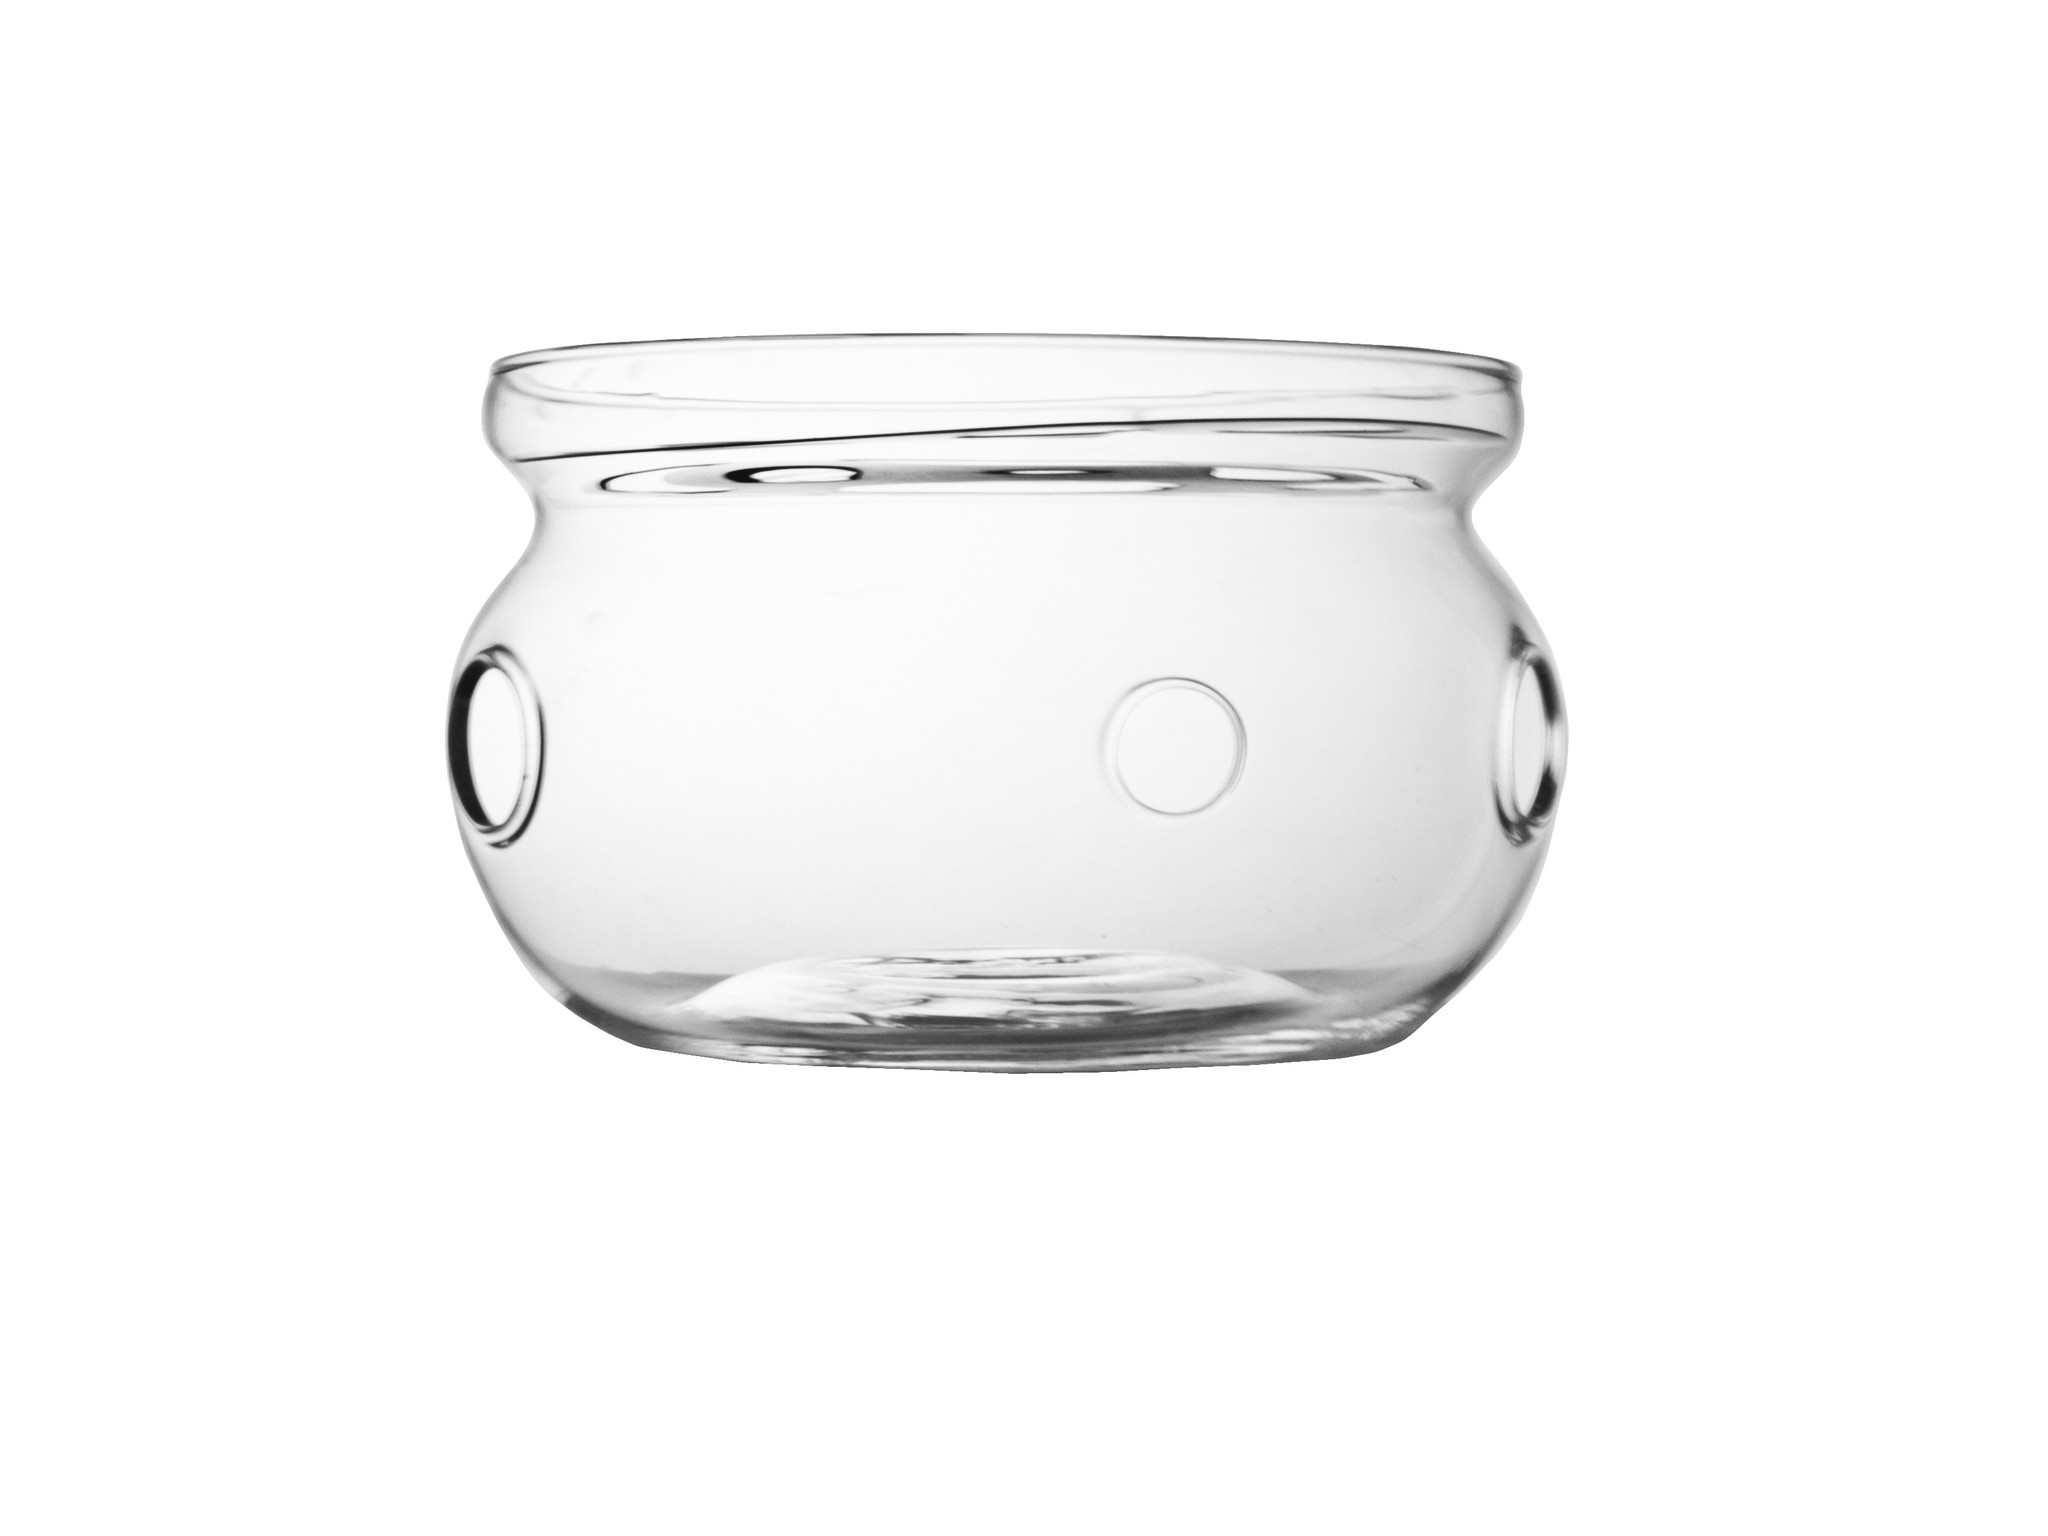 Bredemeijer Theelicht Verona enkelwandig glas